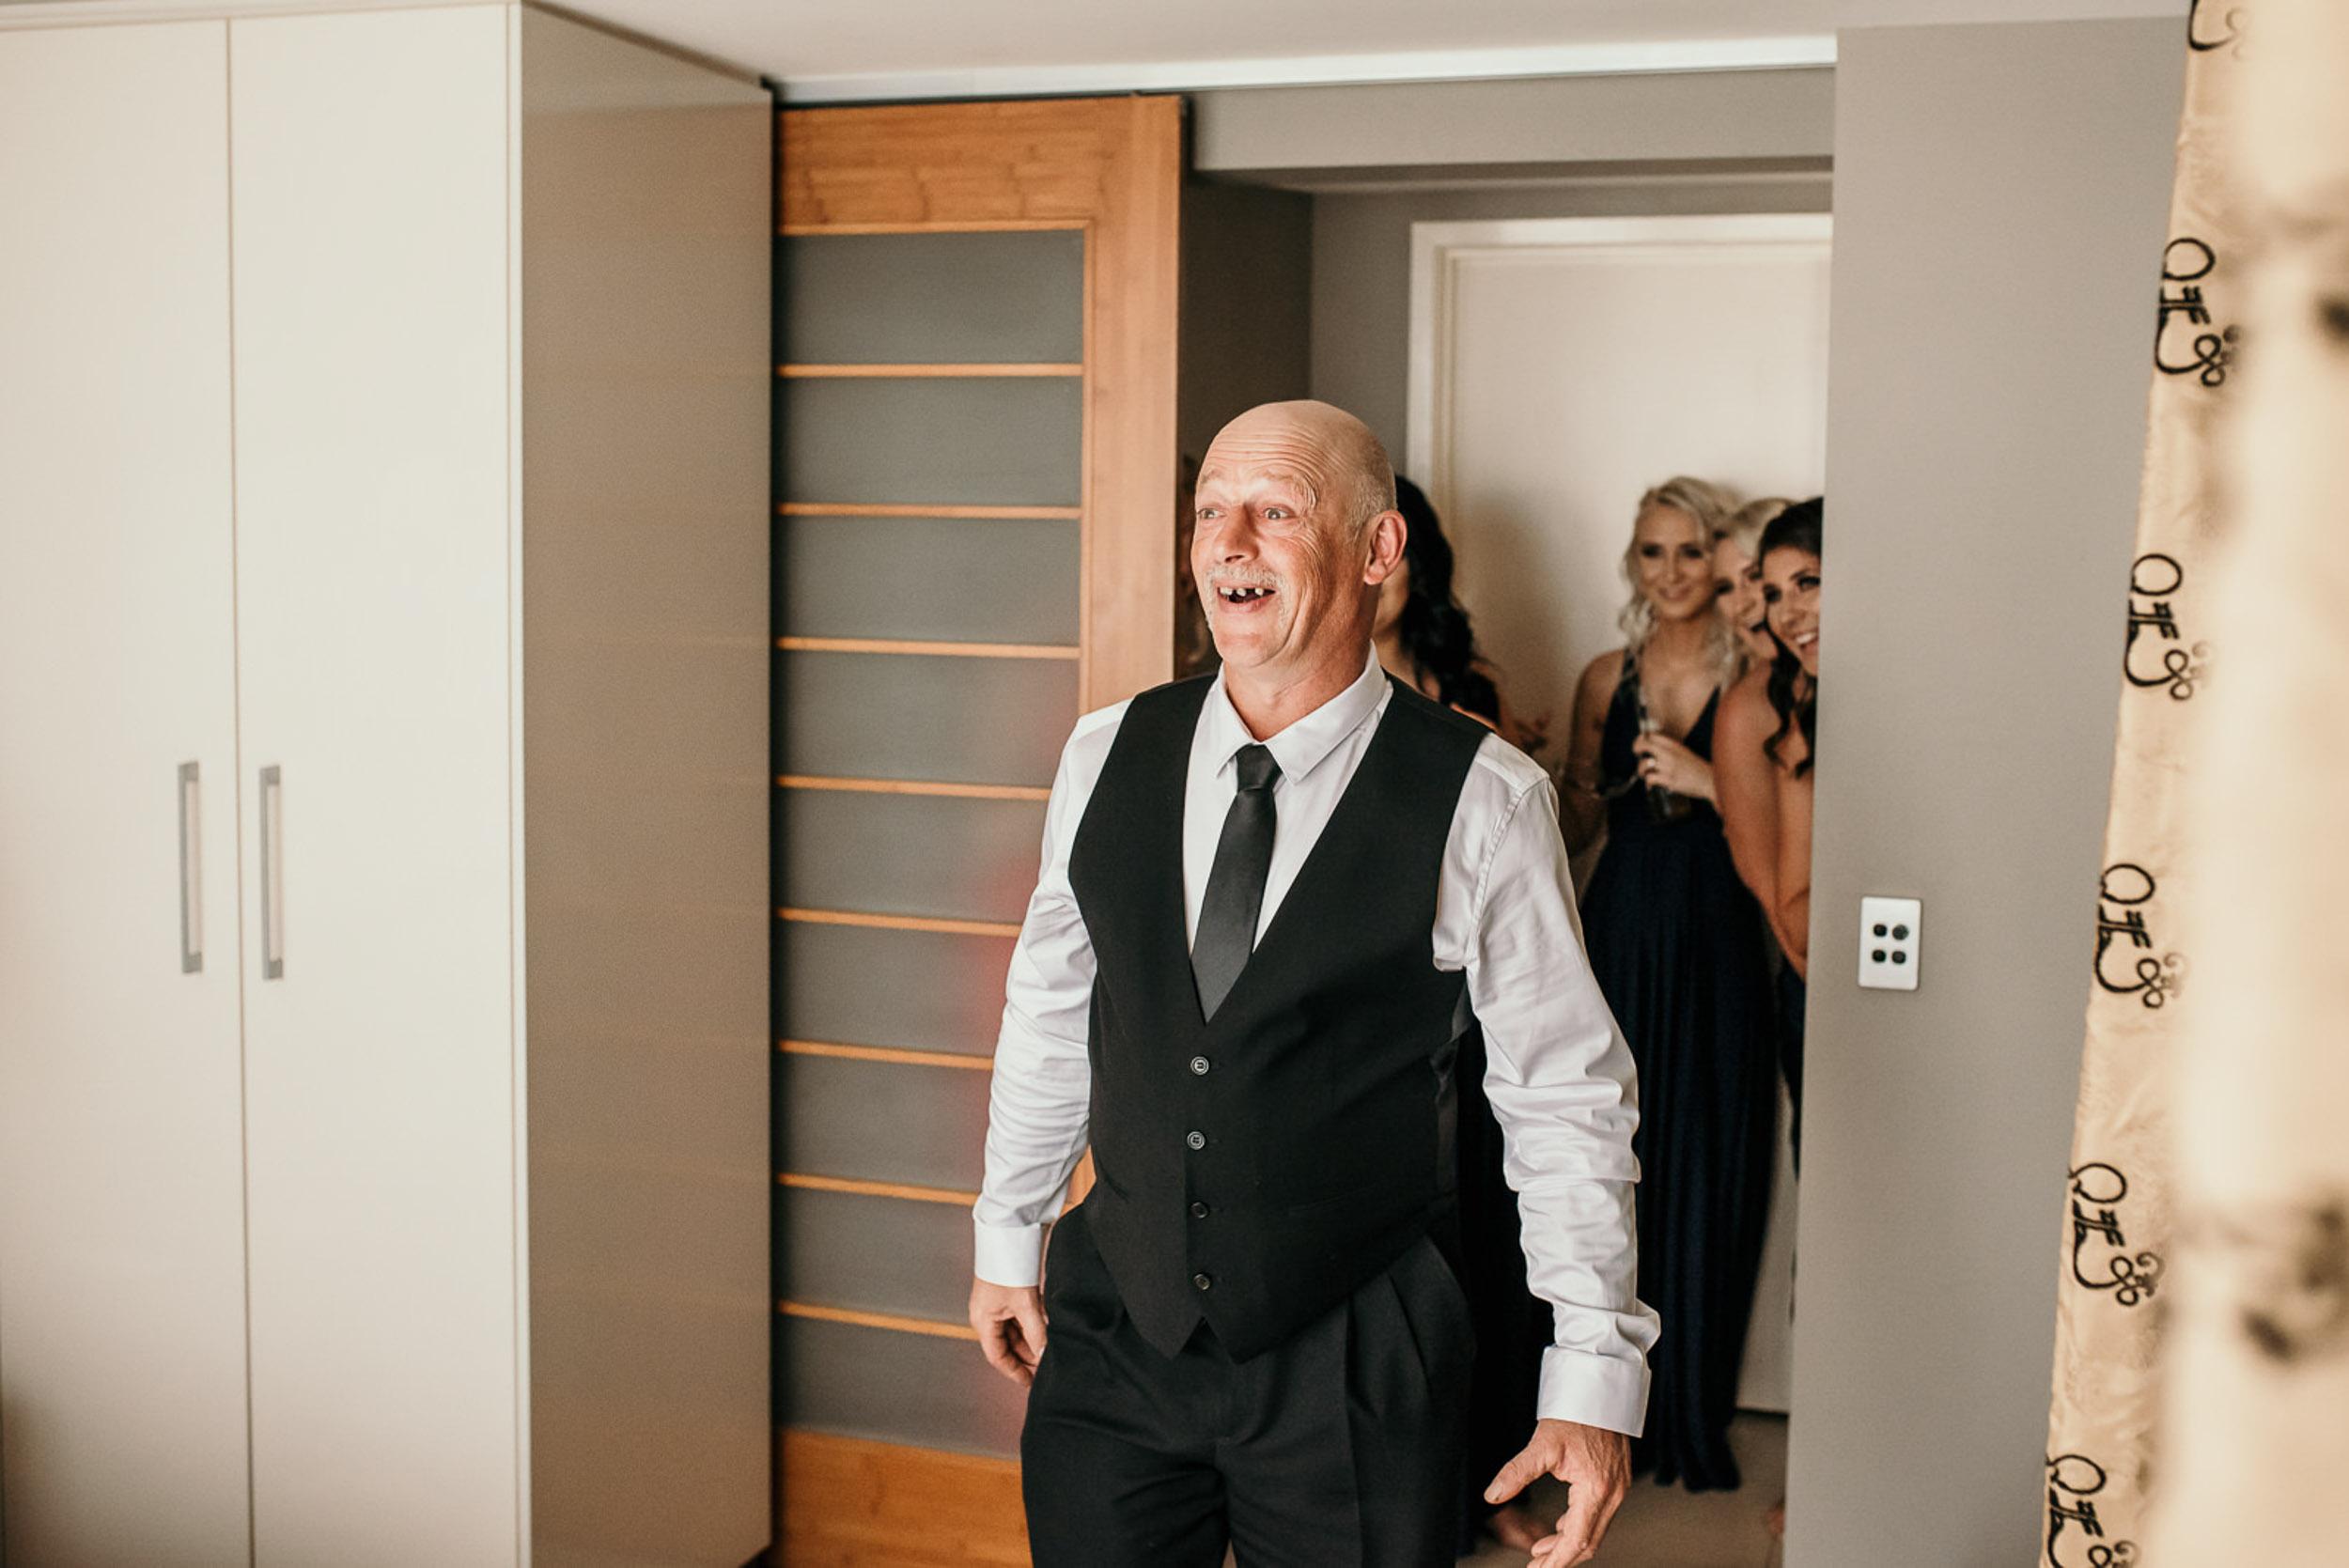 The Raw Photographer - Cairns Wedding Photographer - Fitzroy Island - Destination Wedding - Bride Dress - Groom Portrait - Queensland-16.jpg